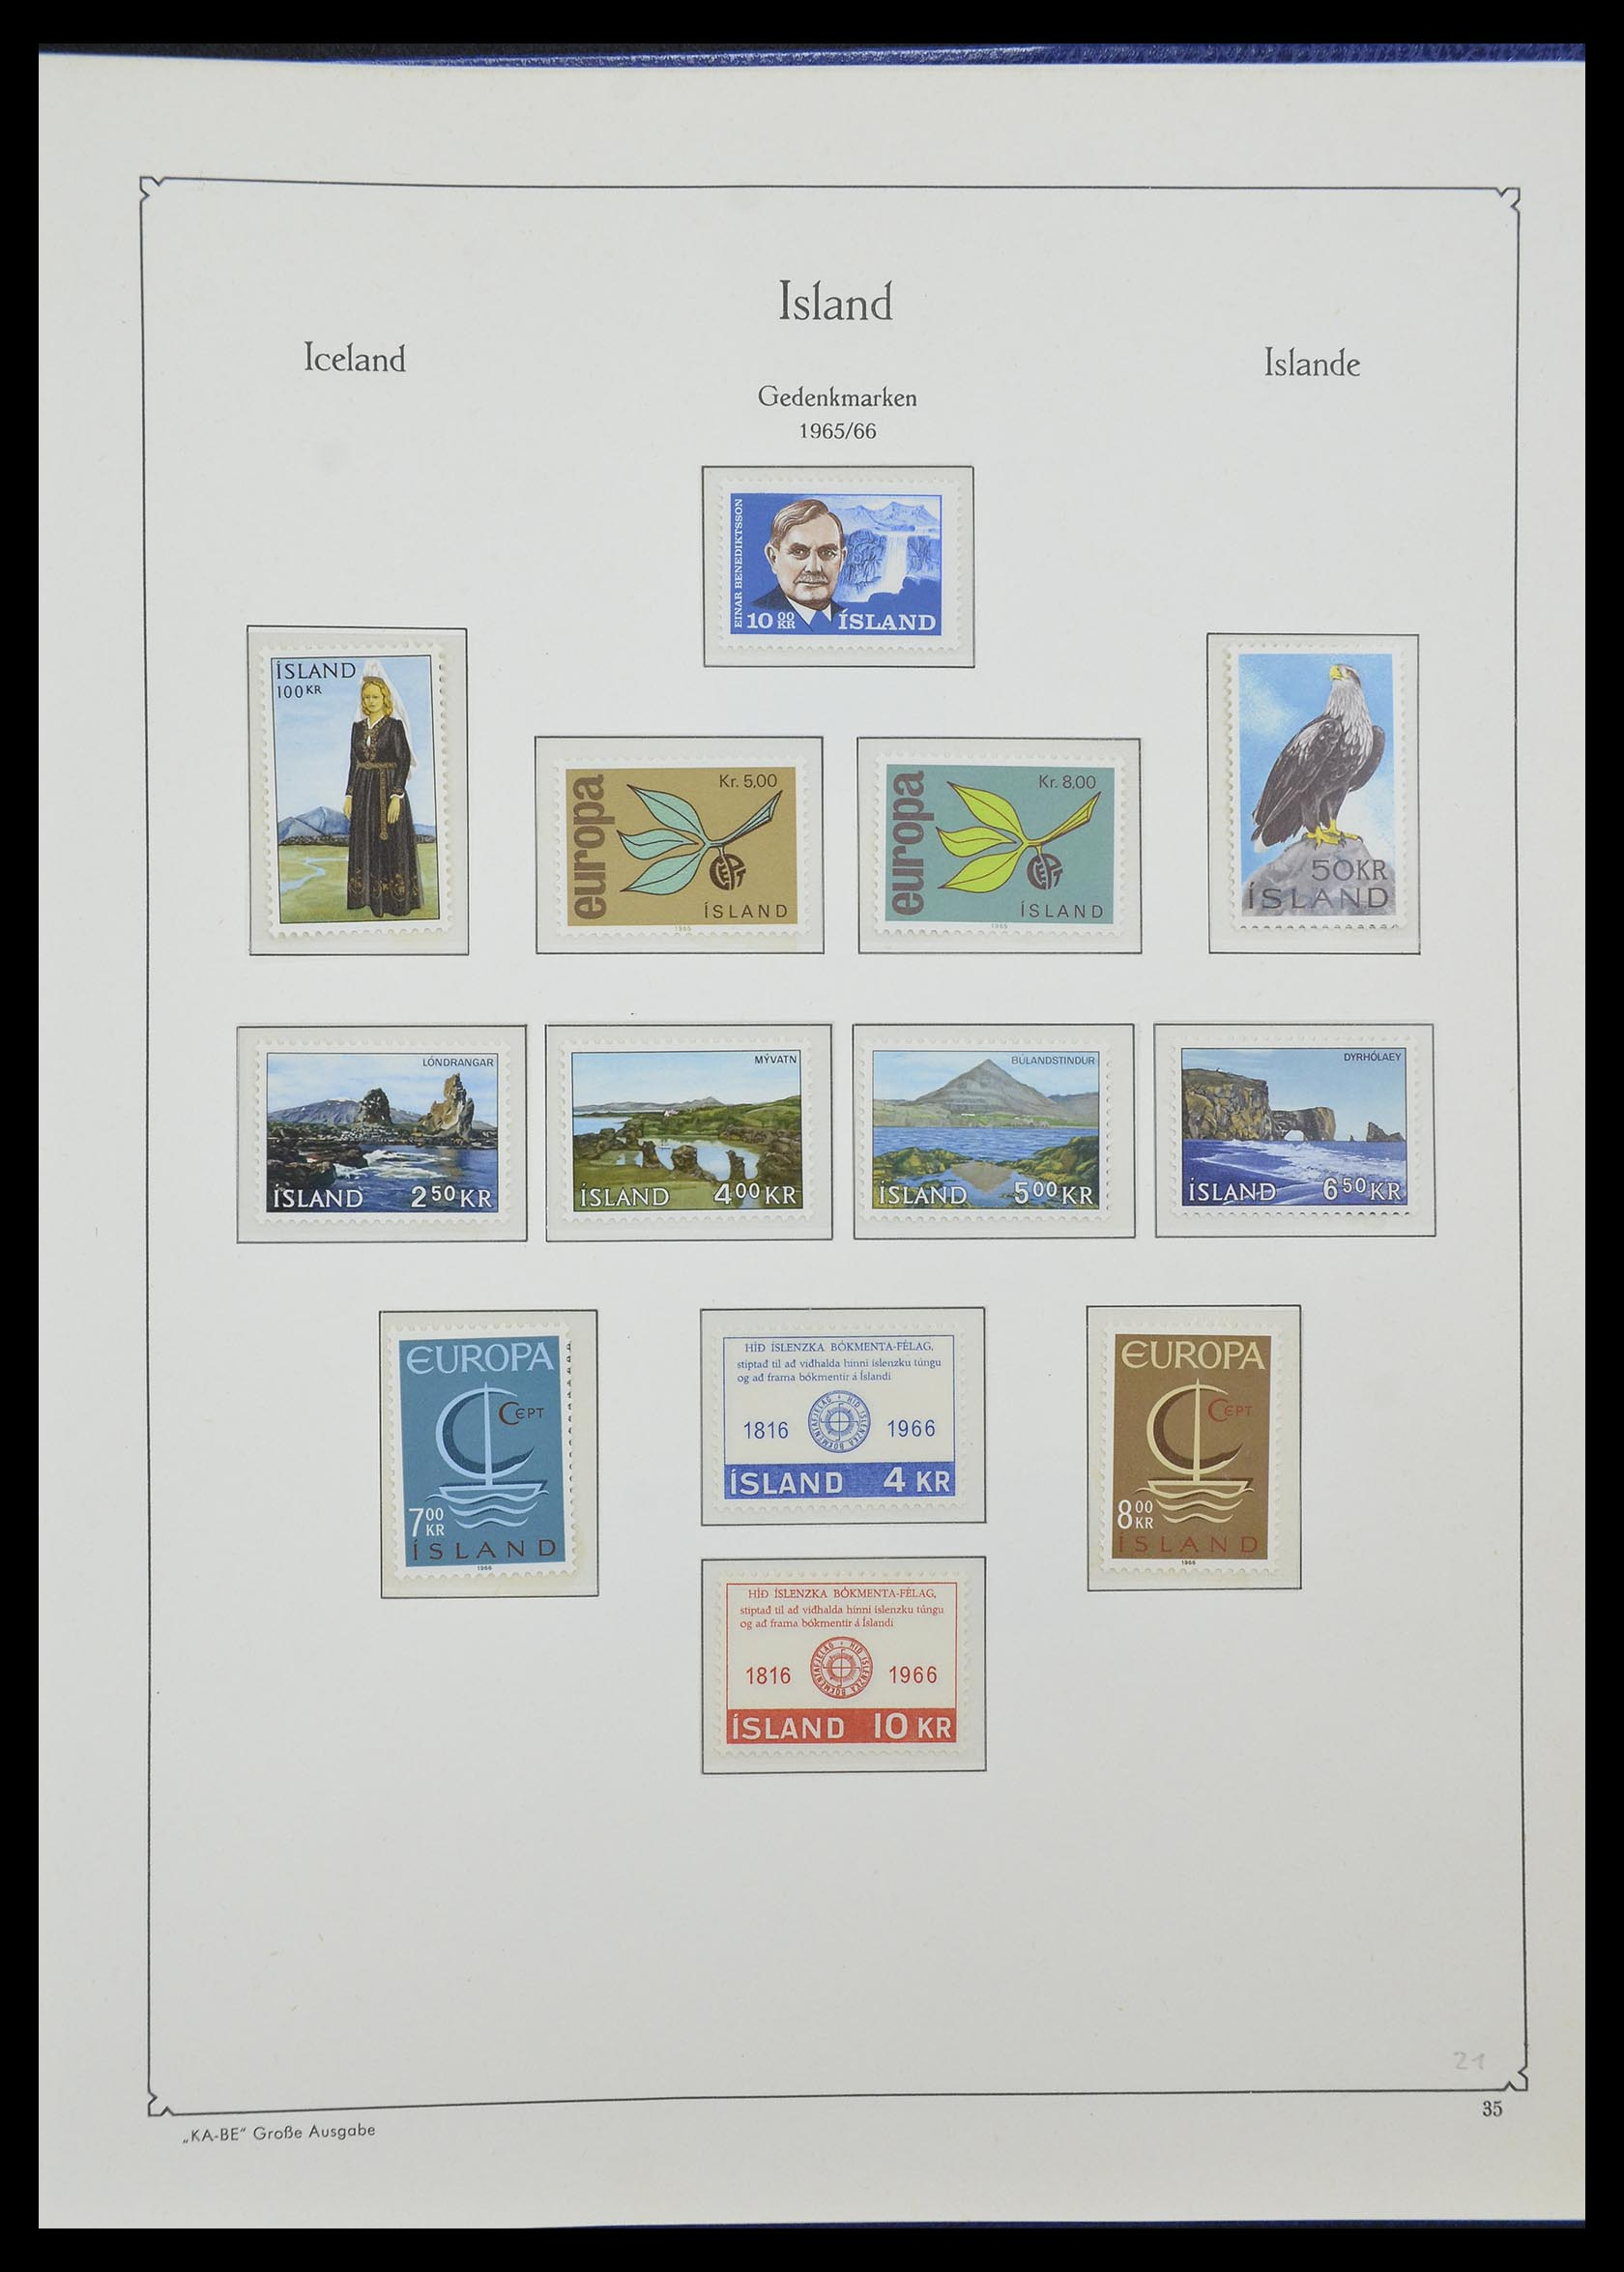 33185 018 - Postzegelverzameling 33184 Finland 1856-1990.